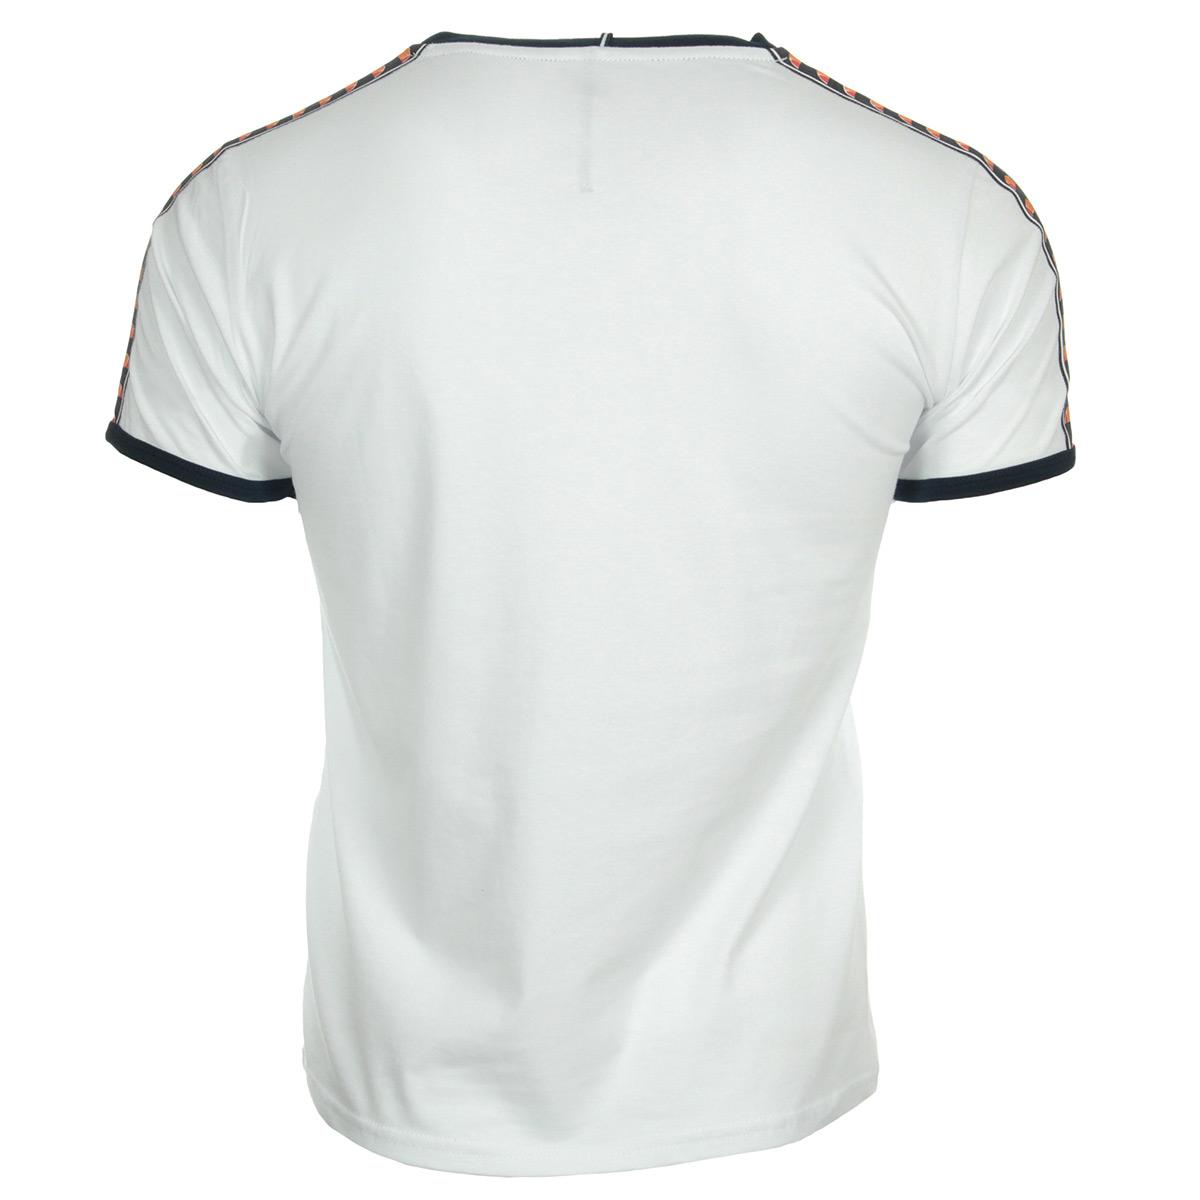 Ellesse T-Shirt EH Homme Bande Blanc 1031NBANDEBLANC, T-Shirts homme